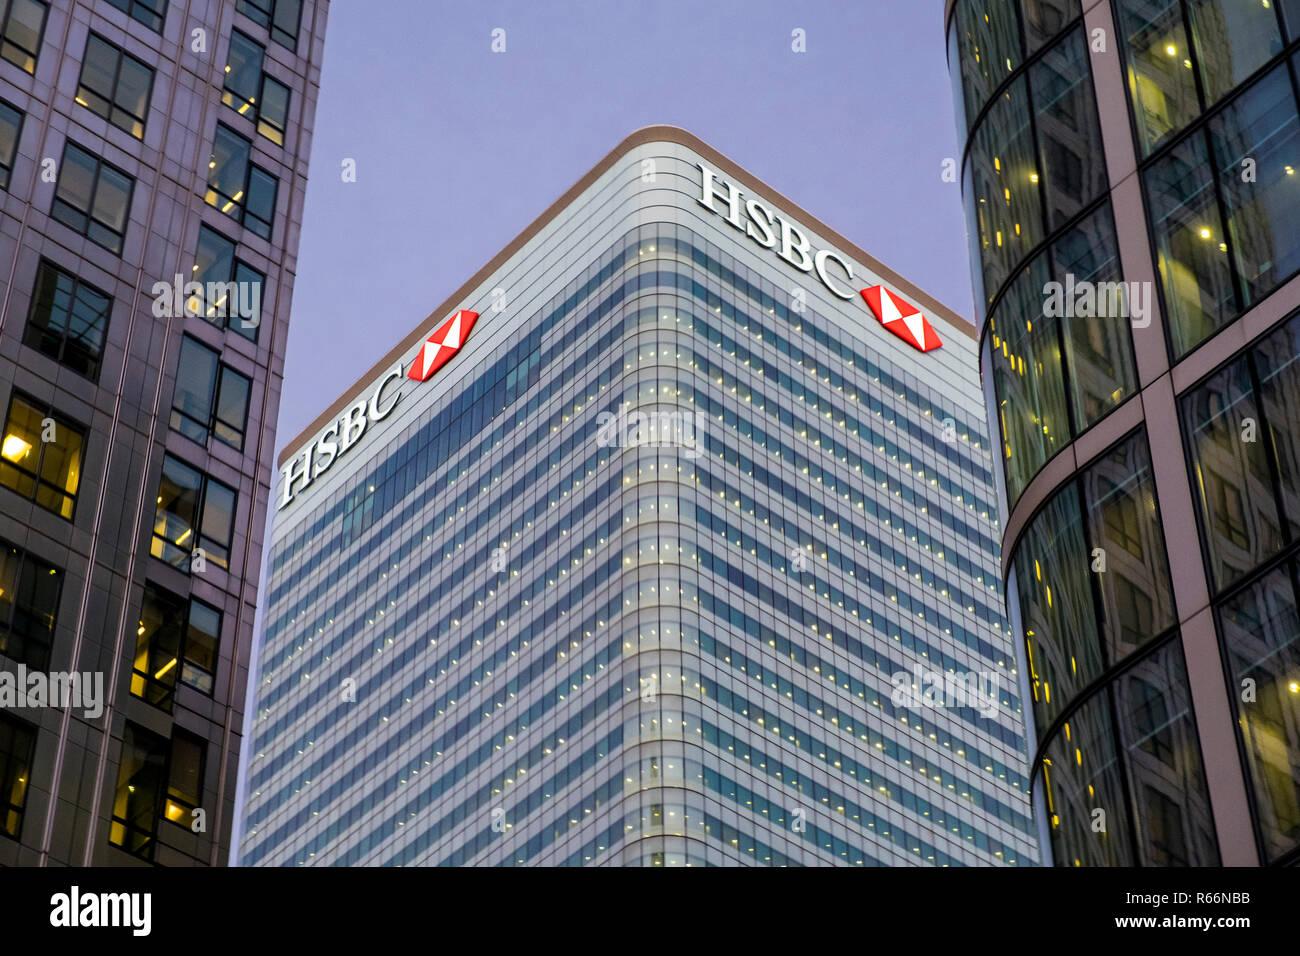 HSBC Bank building in Docklands, London, UK. - Stock Image